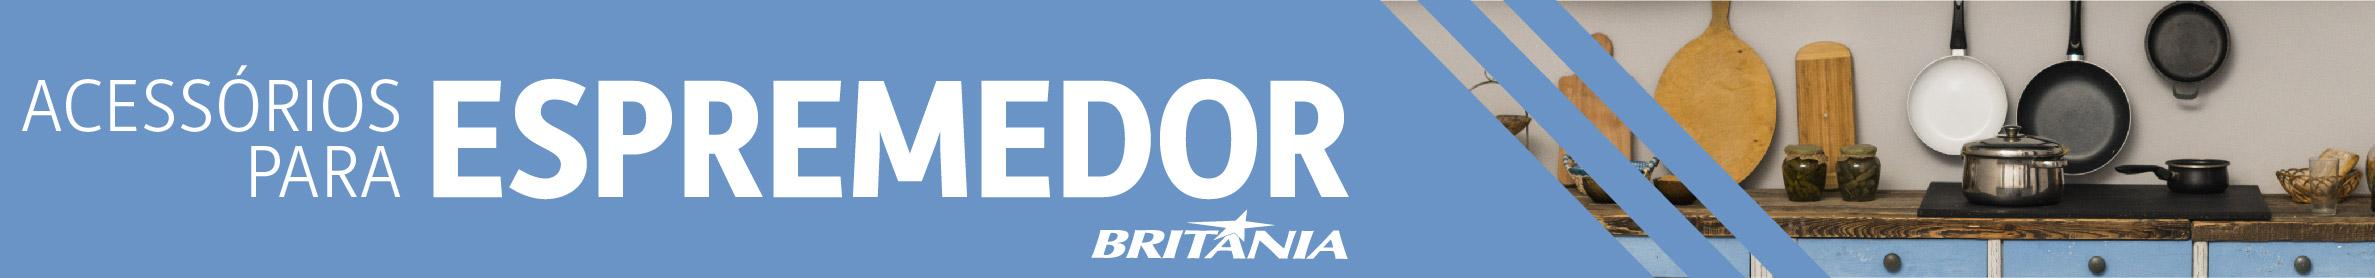 Espremedor-britania